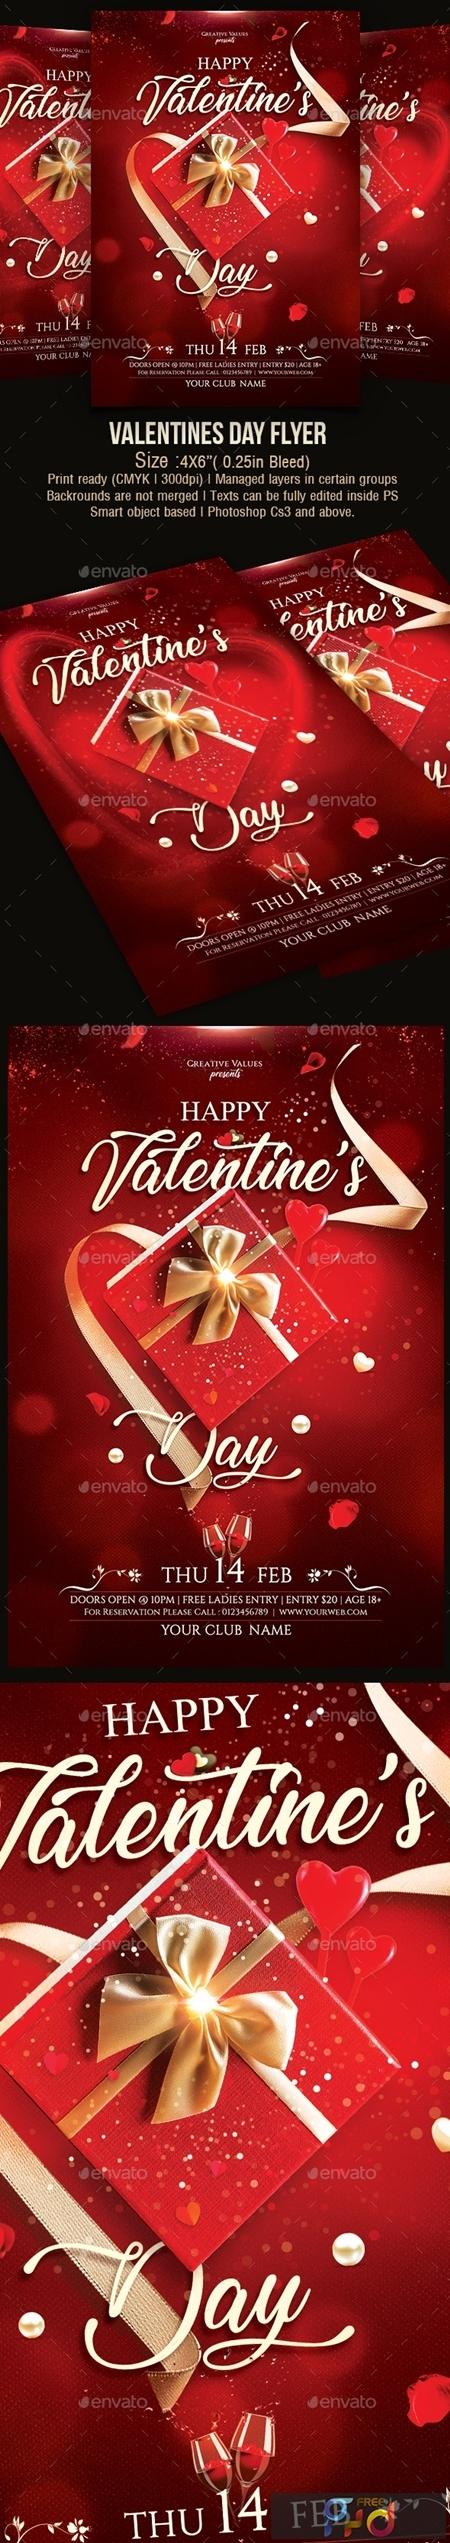 Valentines Day Flyer 23125043 1